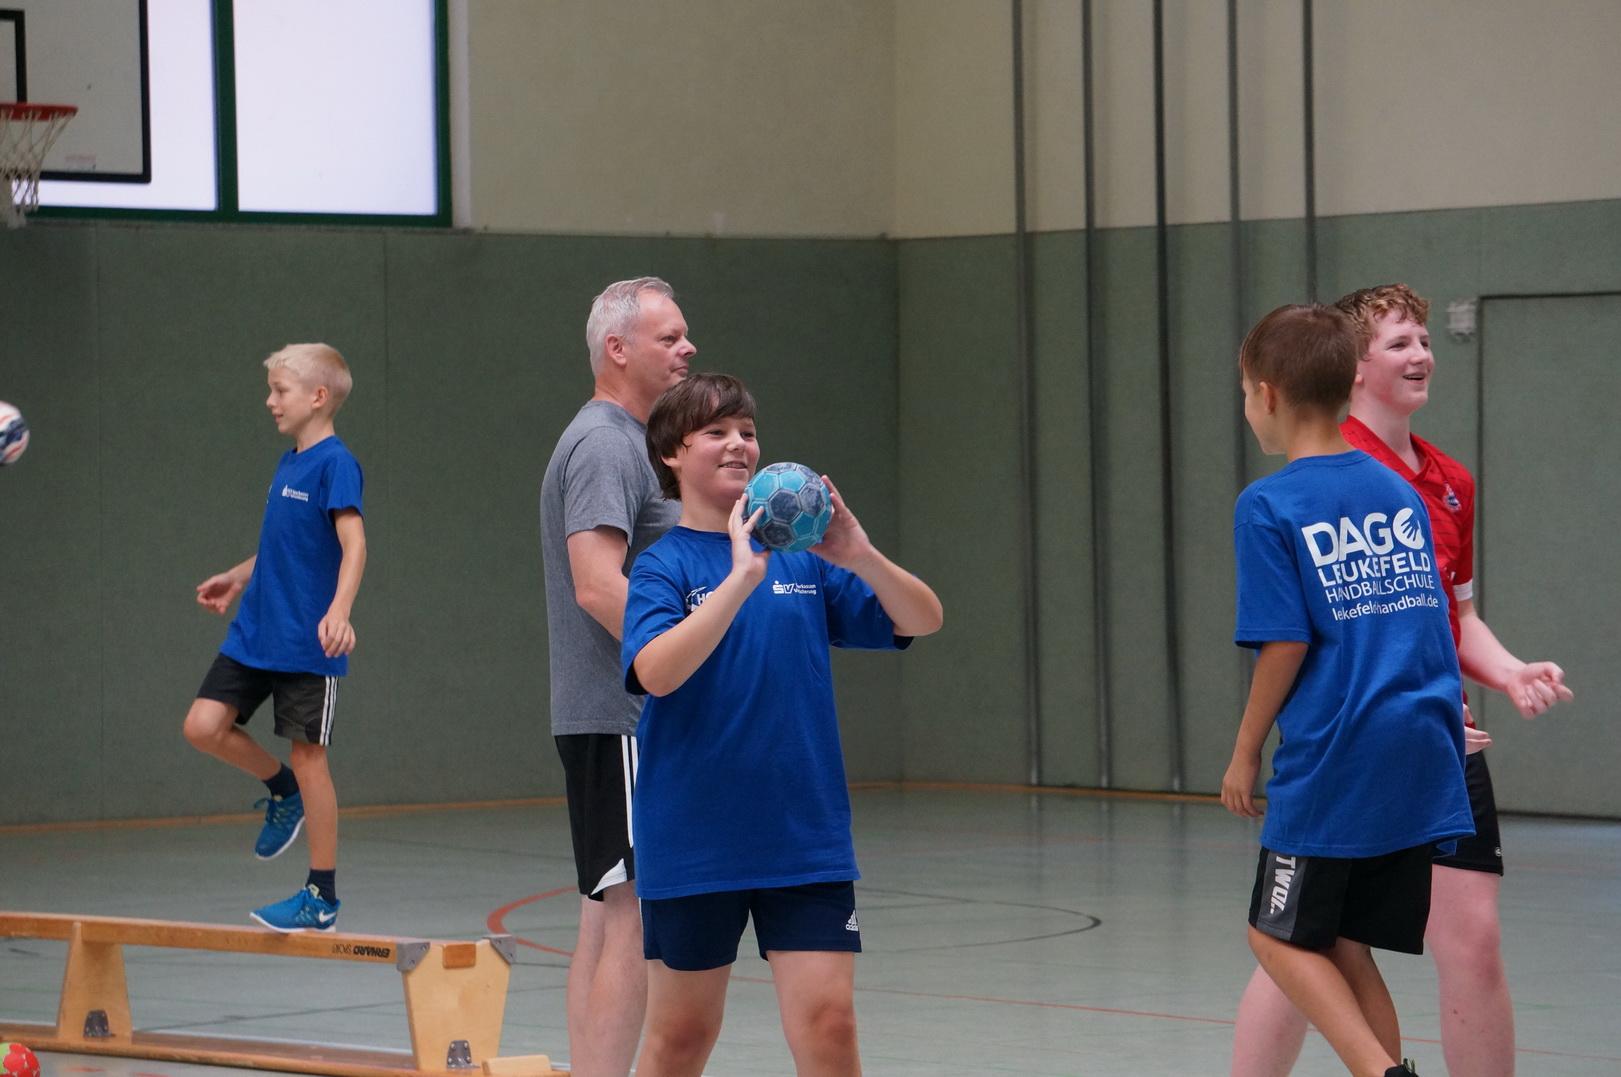 201808_Handballcamp_SDH_MG_177w